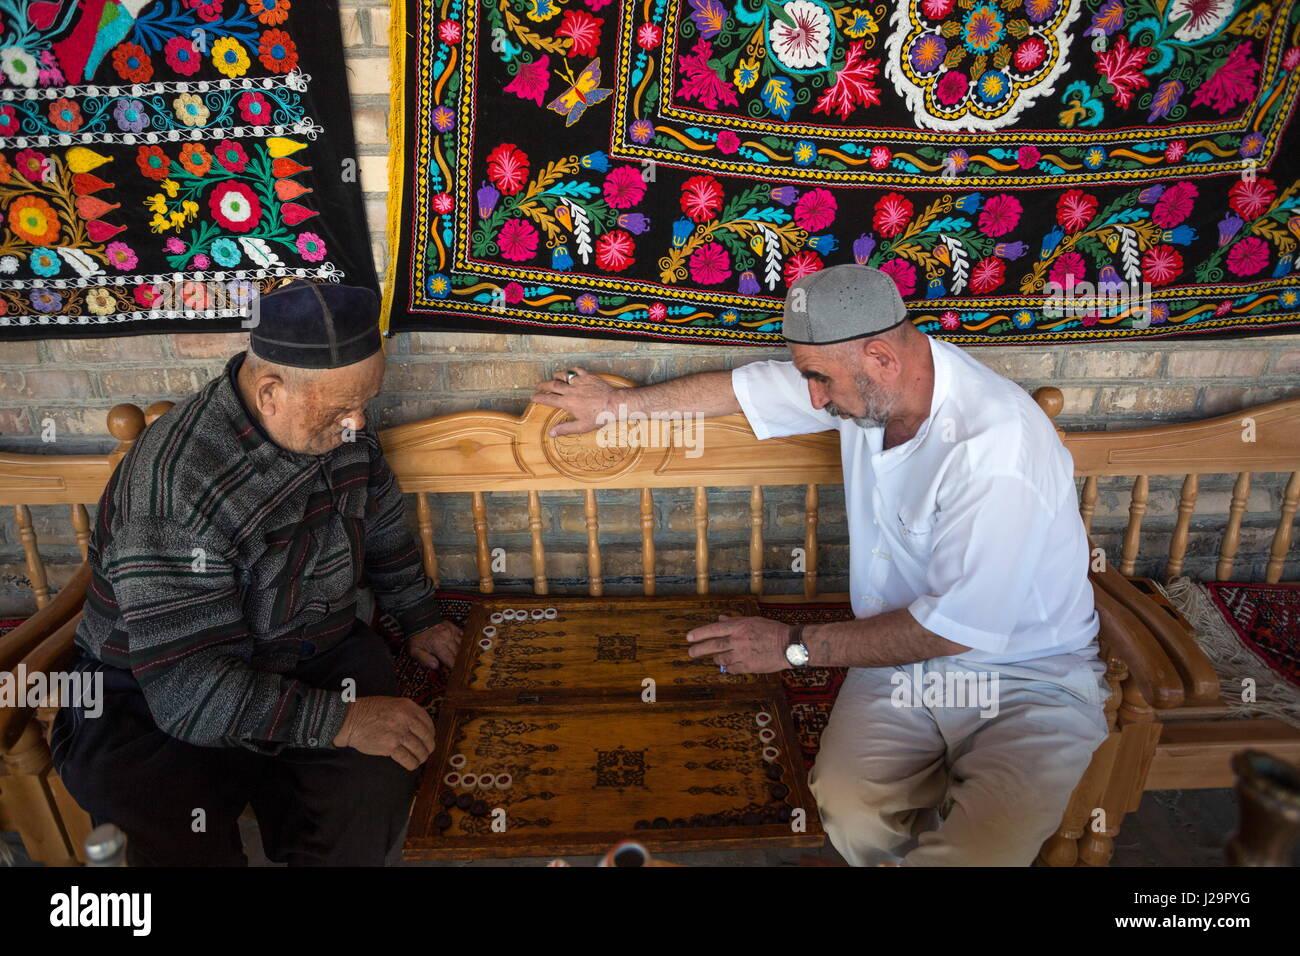 Usbekistan, Bukhara, men Playing Backgamon - Stock Image